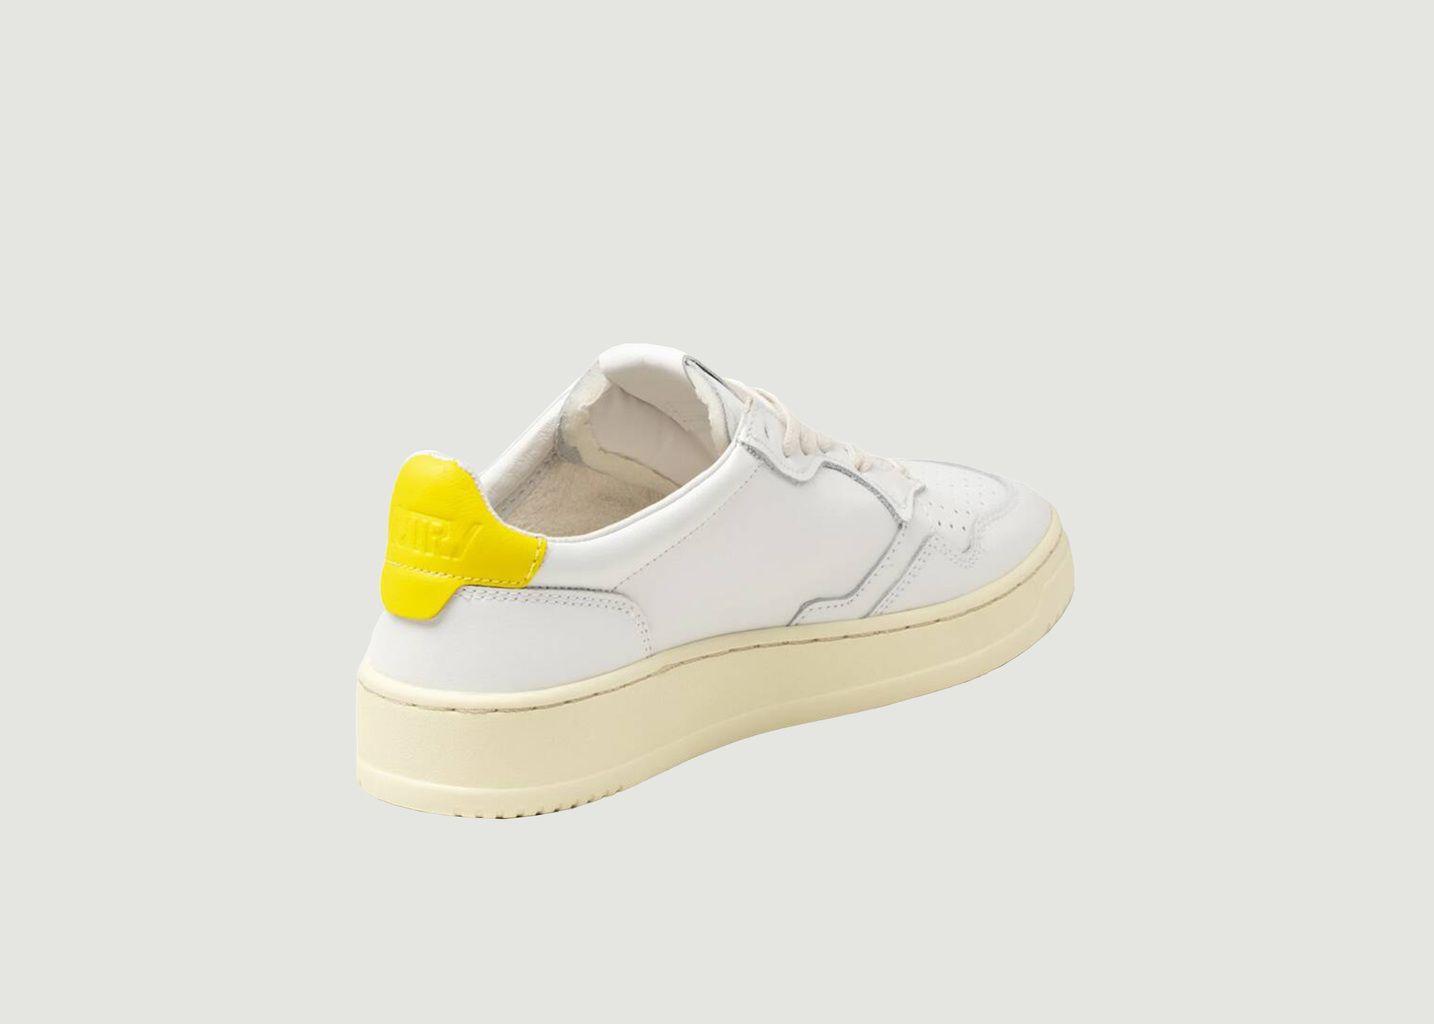 Sneakers 01 Low Man Cuir  Blanc Jaune - AUTRY